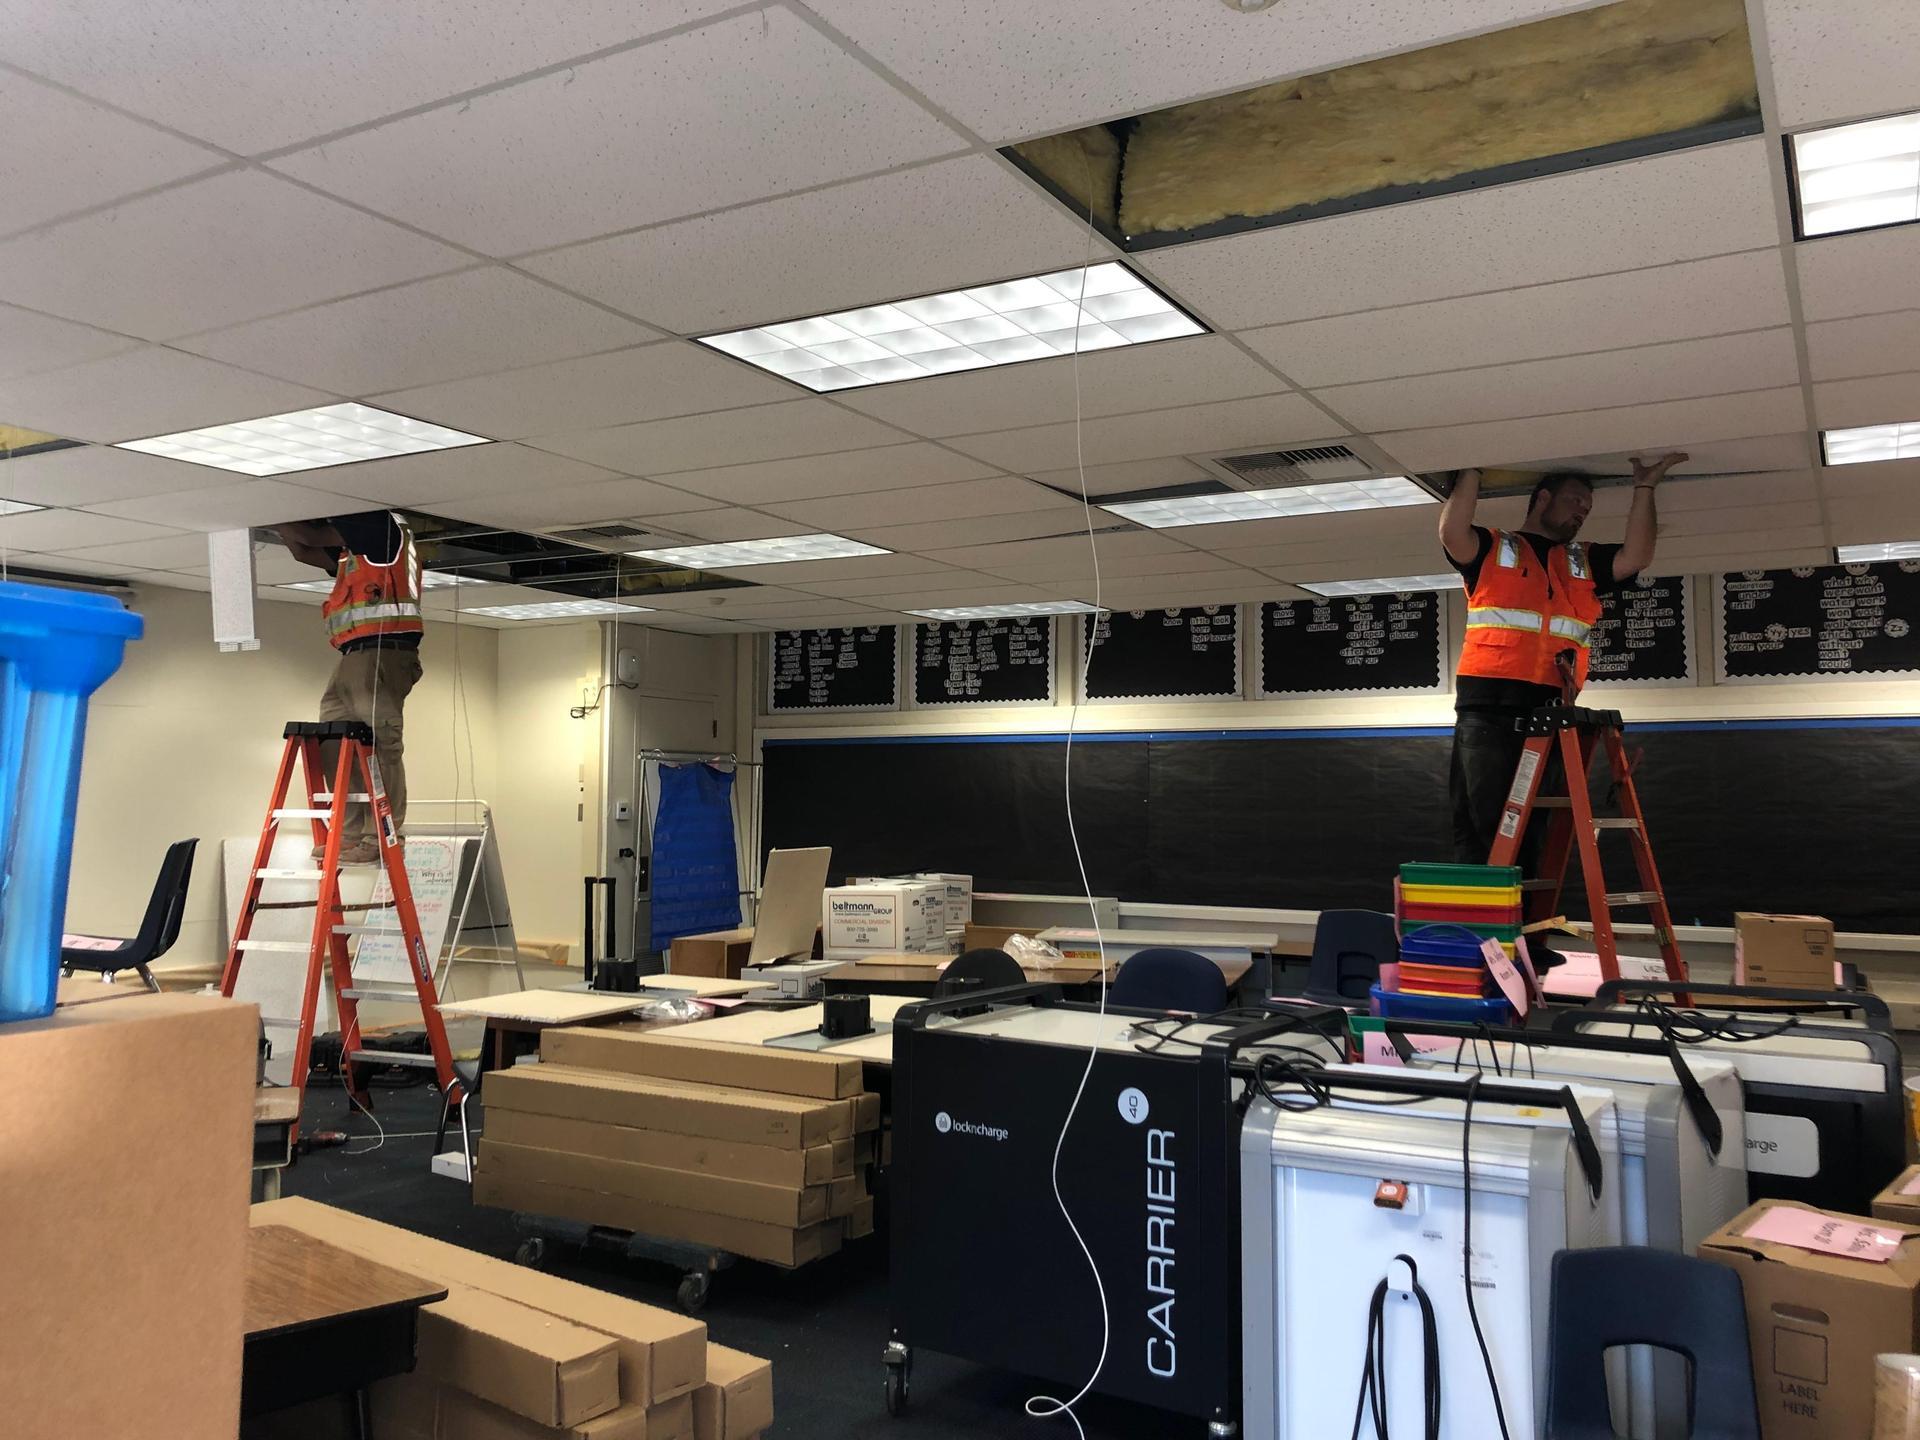 Installing classroom technology